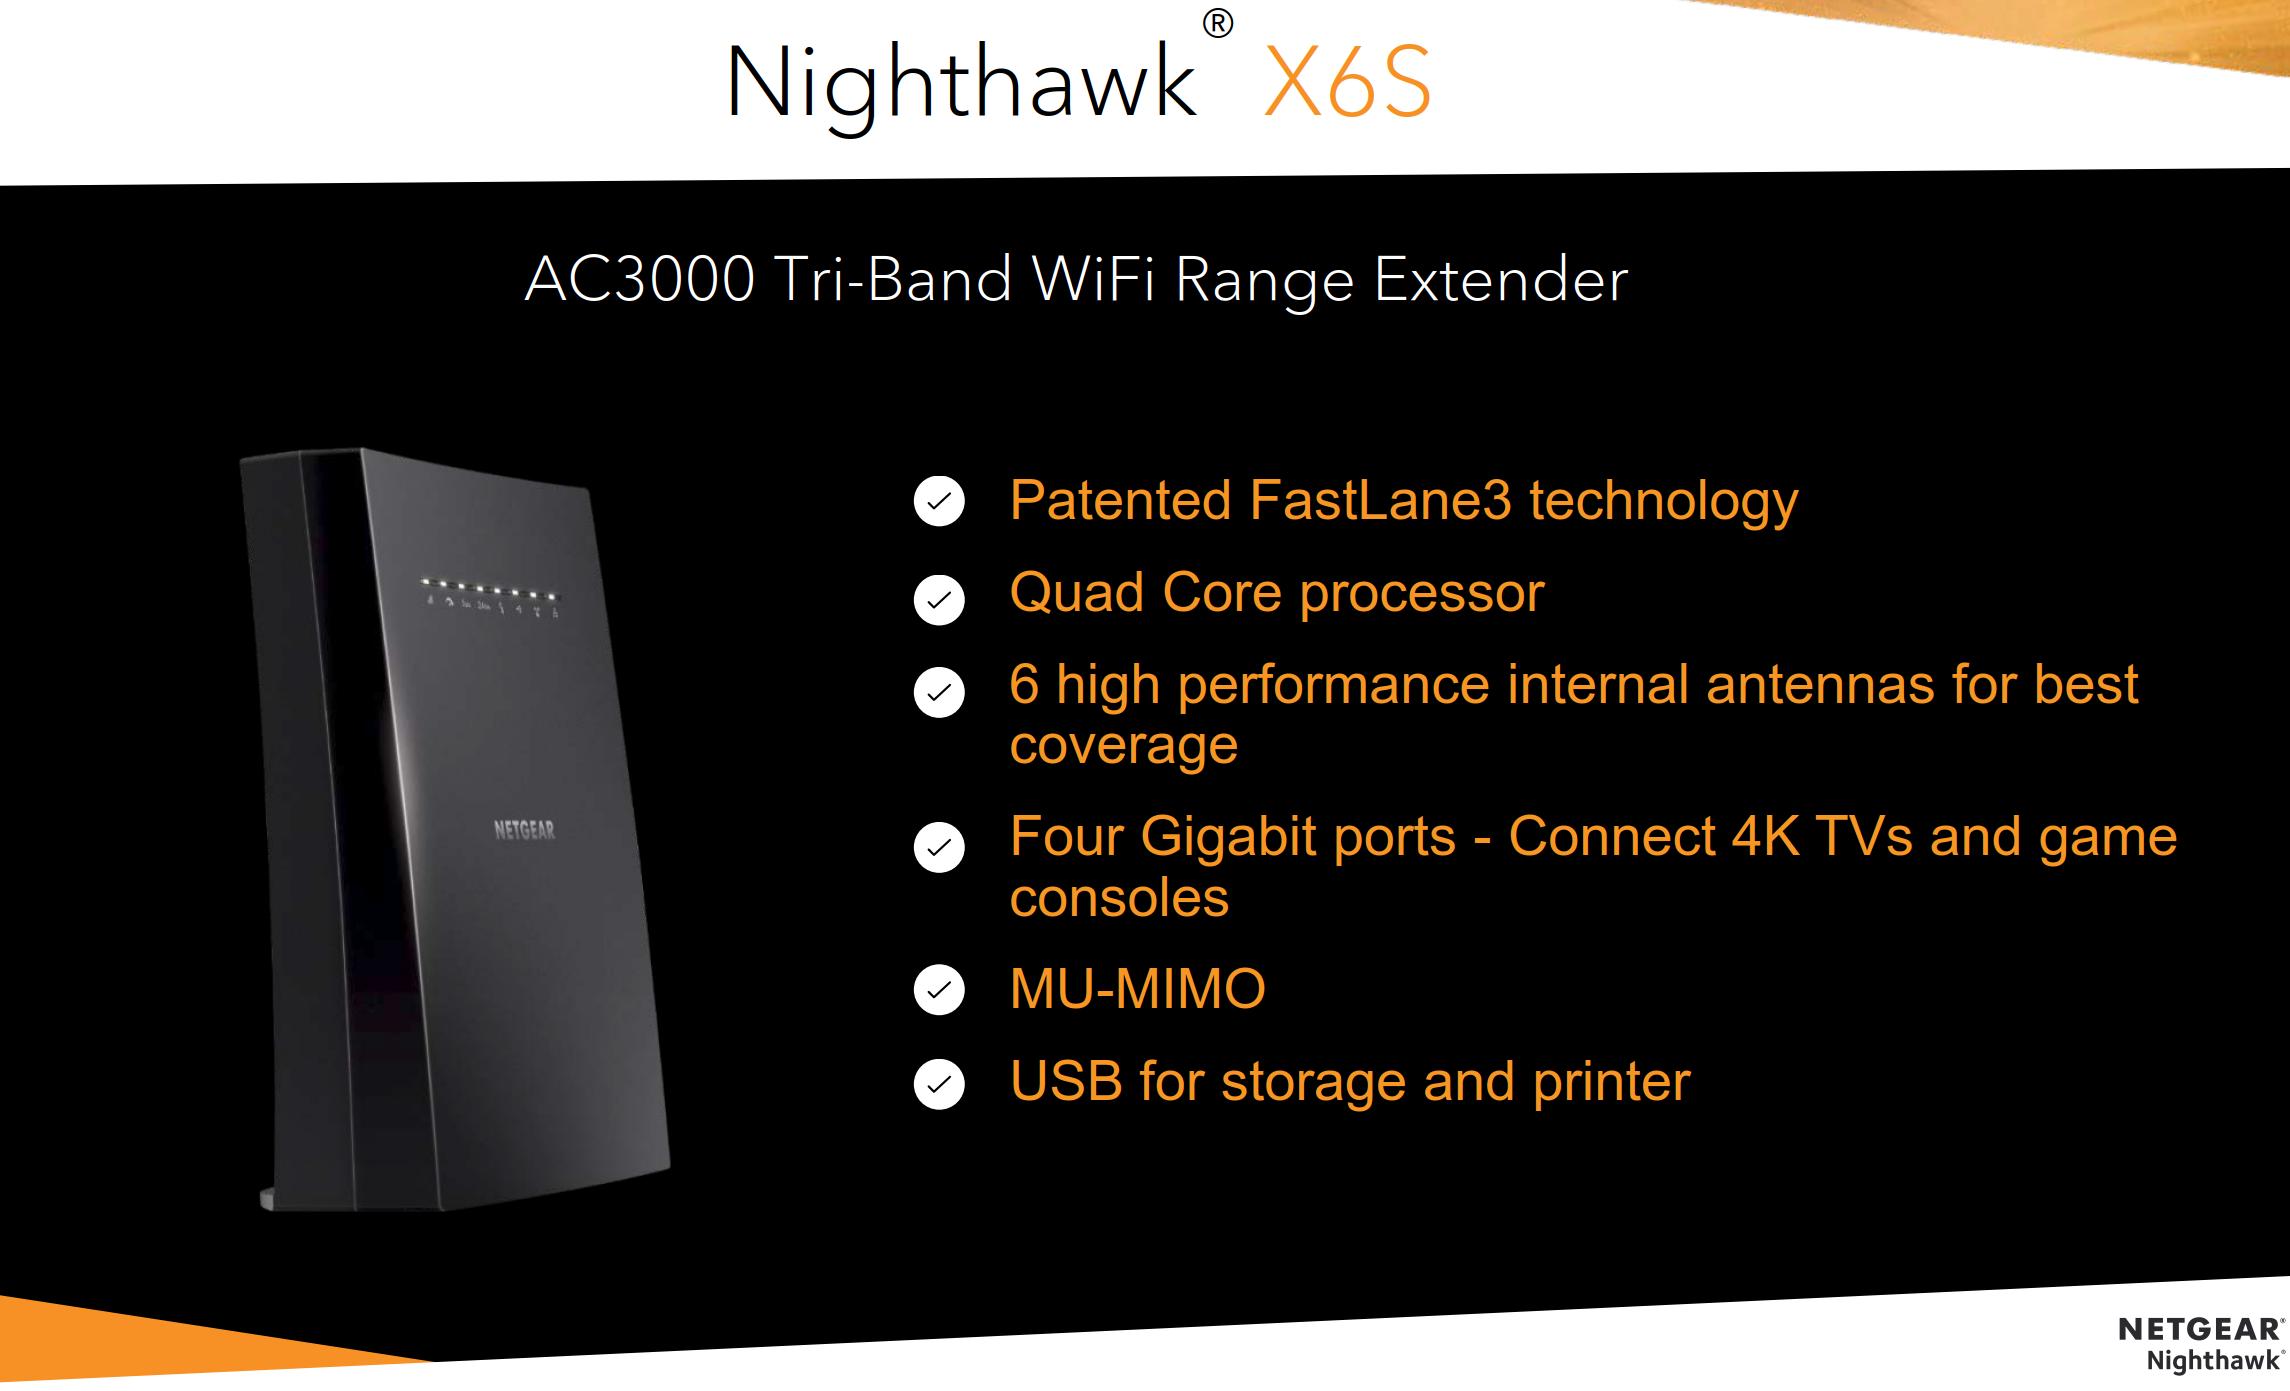 Netgear Nighthawk X6S EX8000 Brings Orbi Tri-band Wi-Fi to